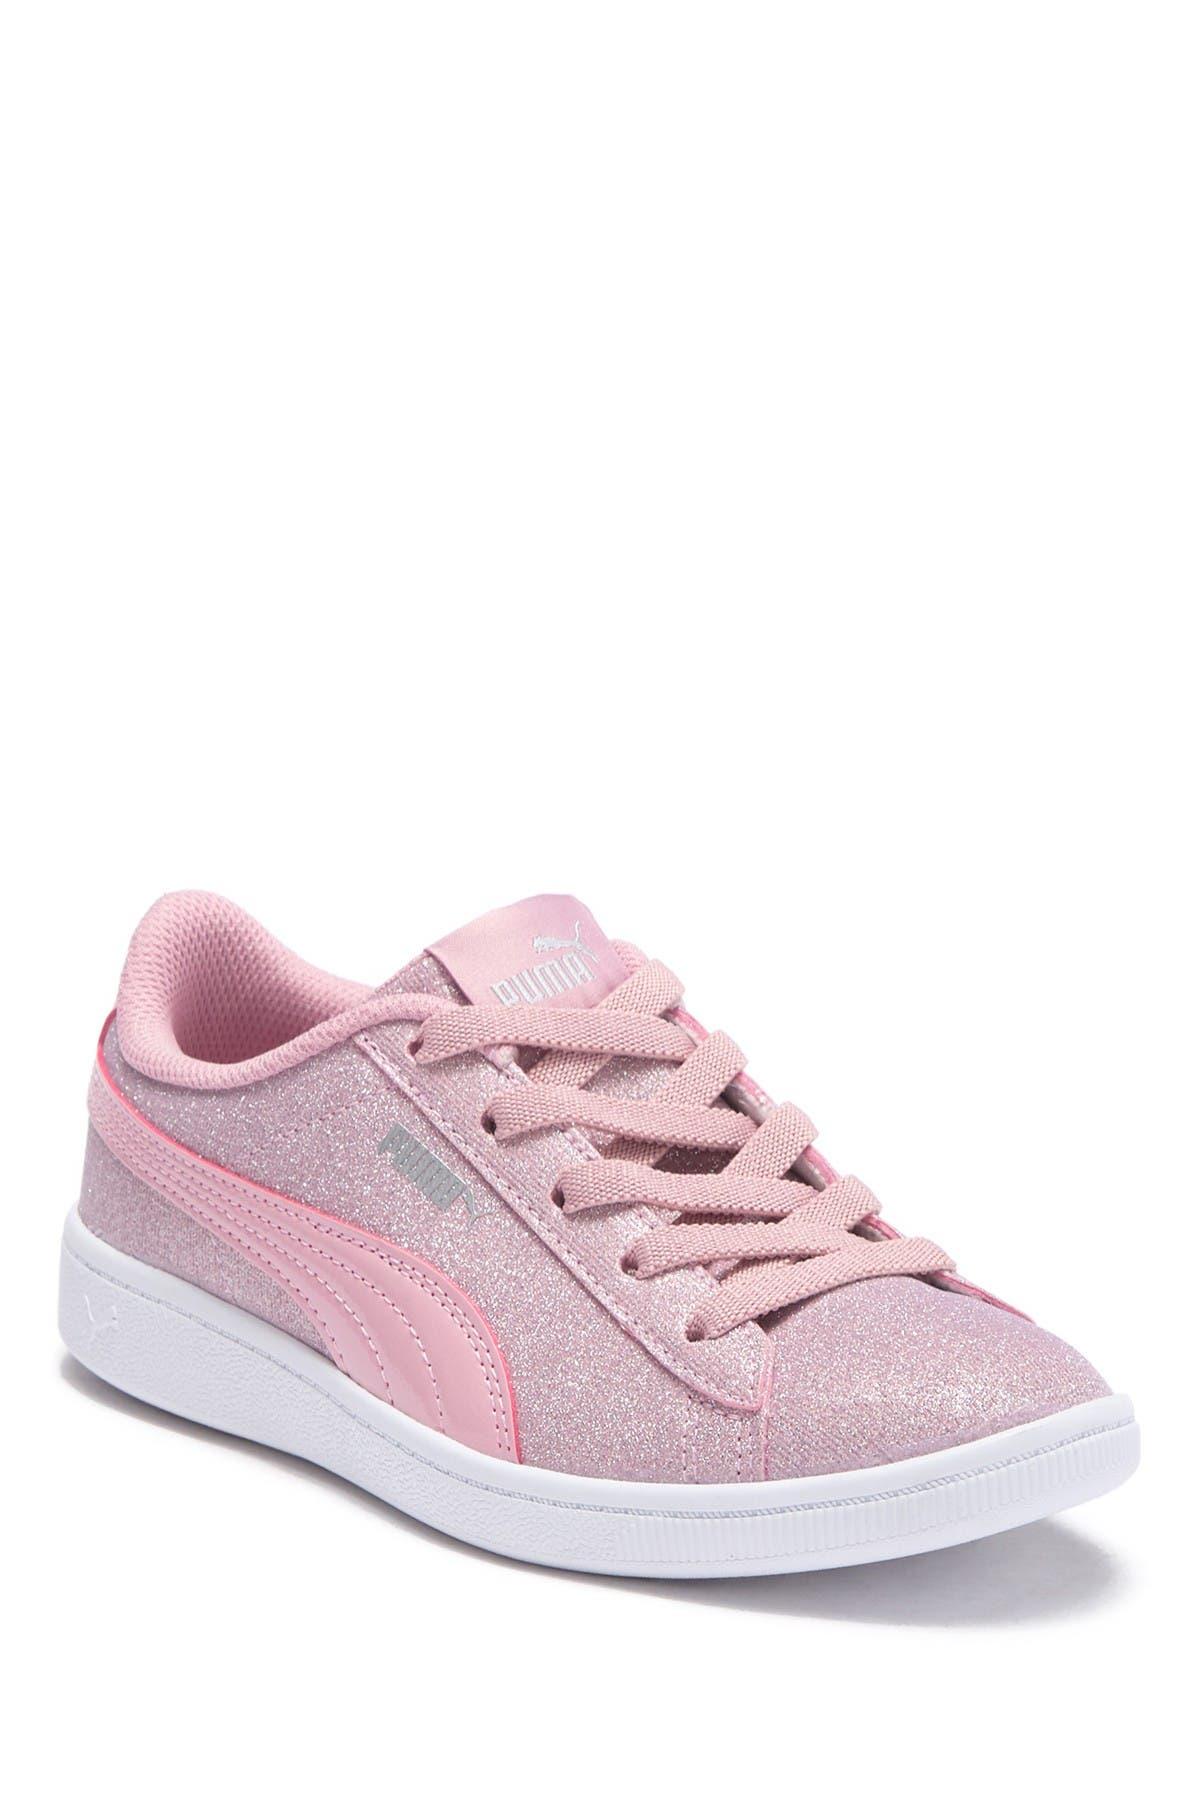 PUMA | Vikky Glitz Sneaker | Nordstrom Rack